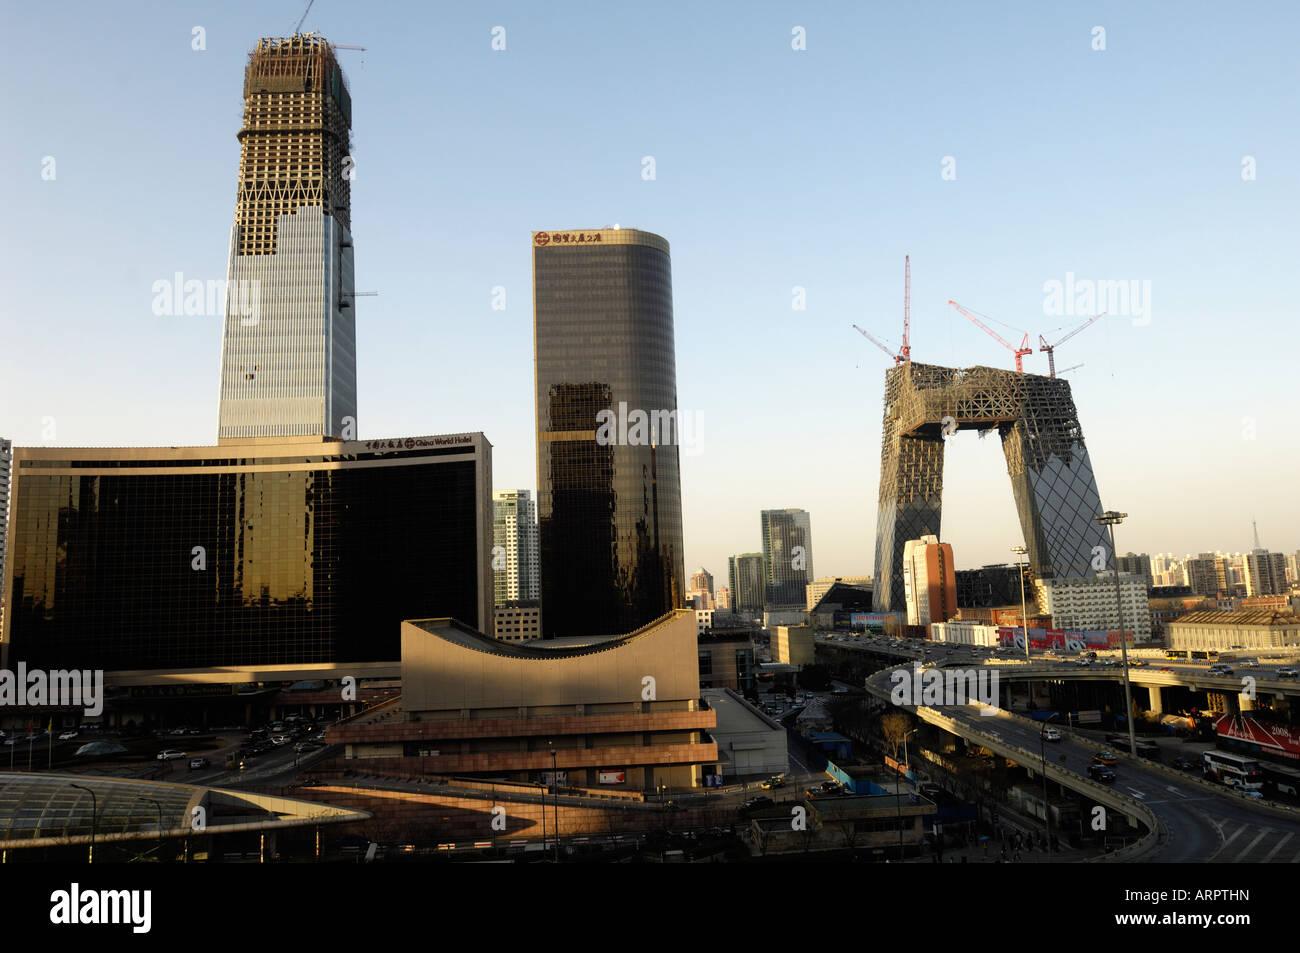 Beijing CBD. 16-Feb-2008 - Stock Image